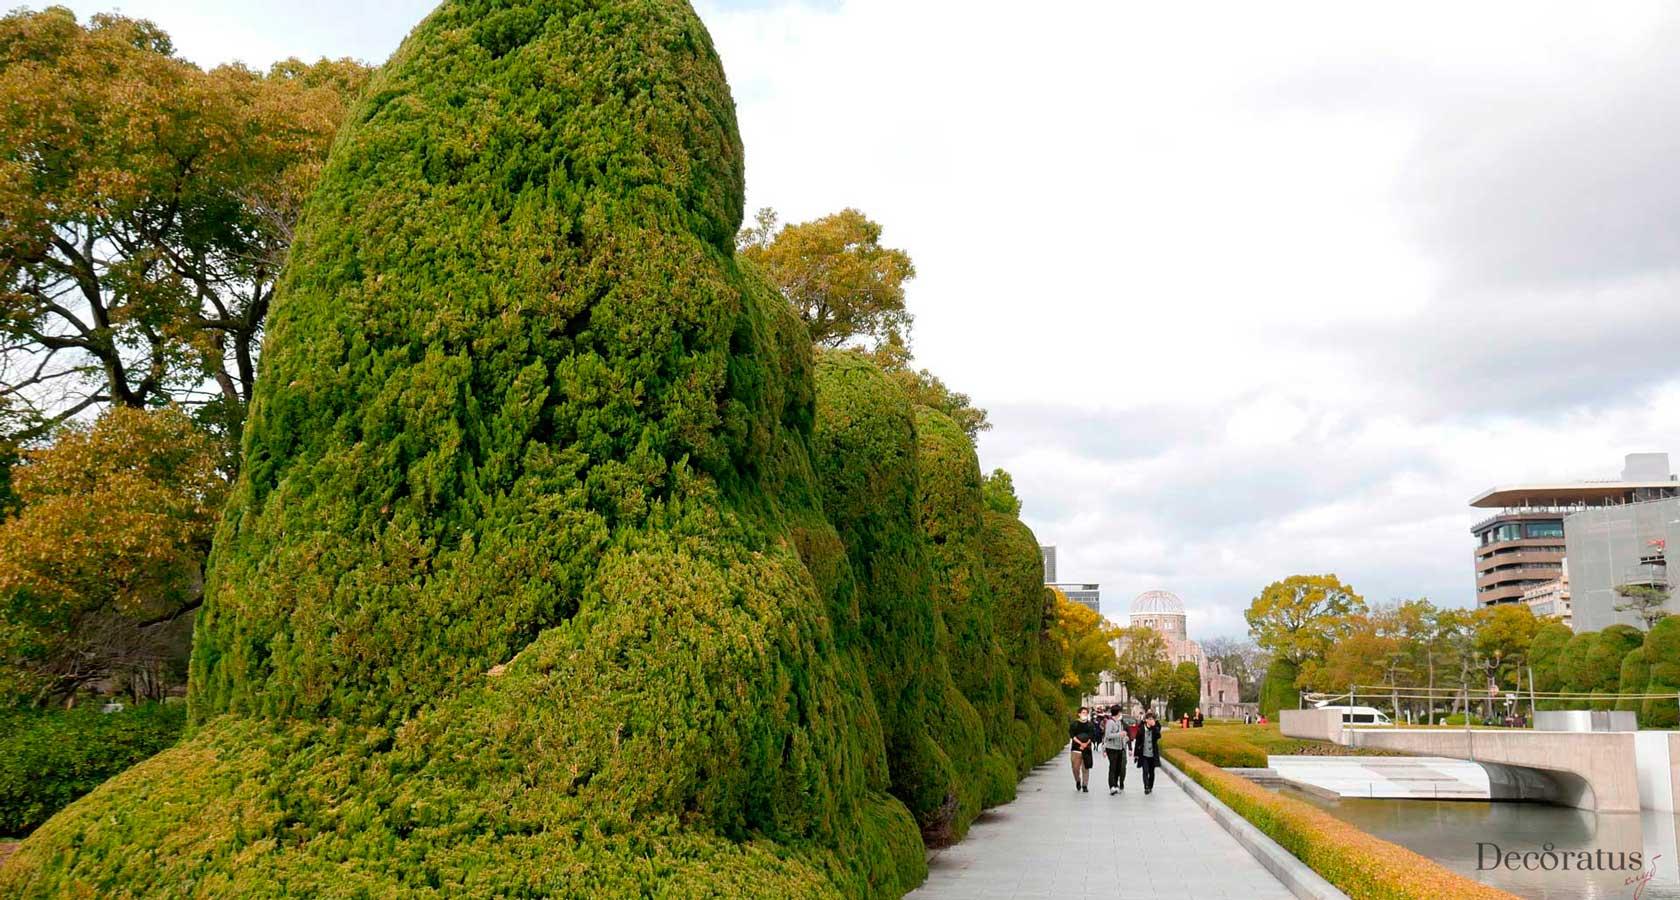 аллея парка мира в городе хиросима япония